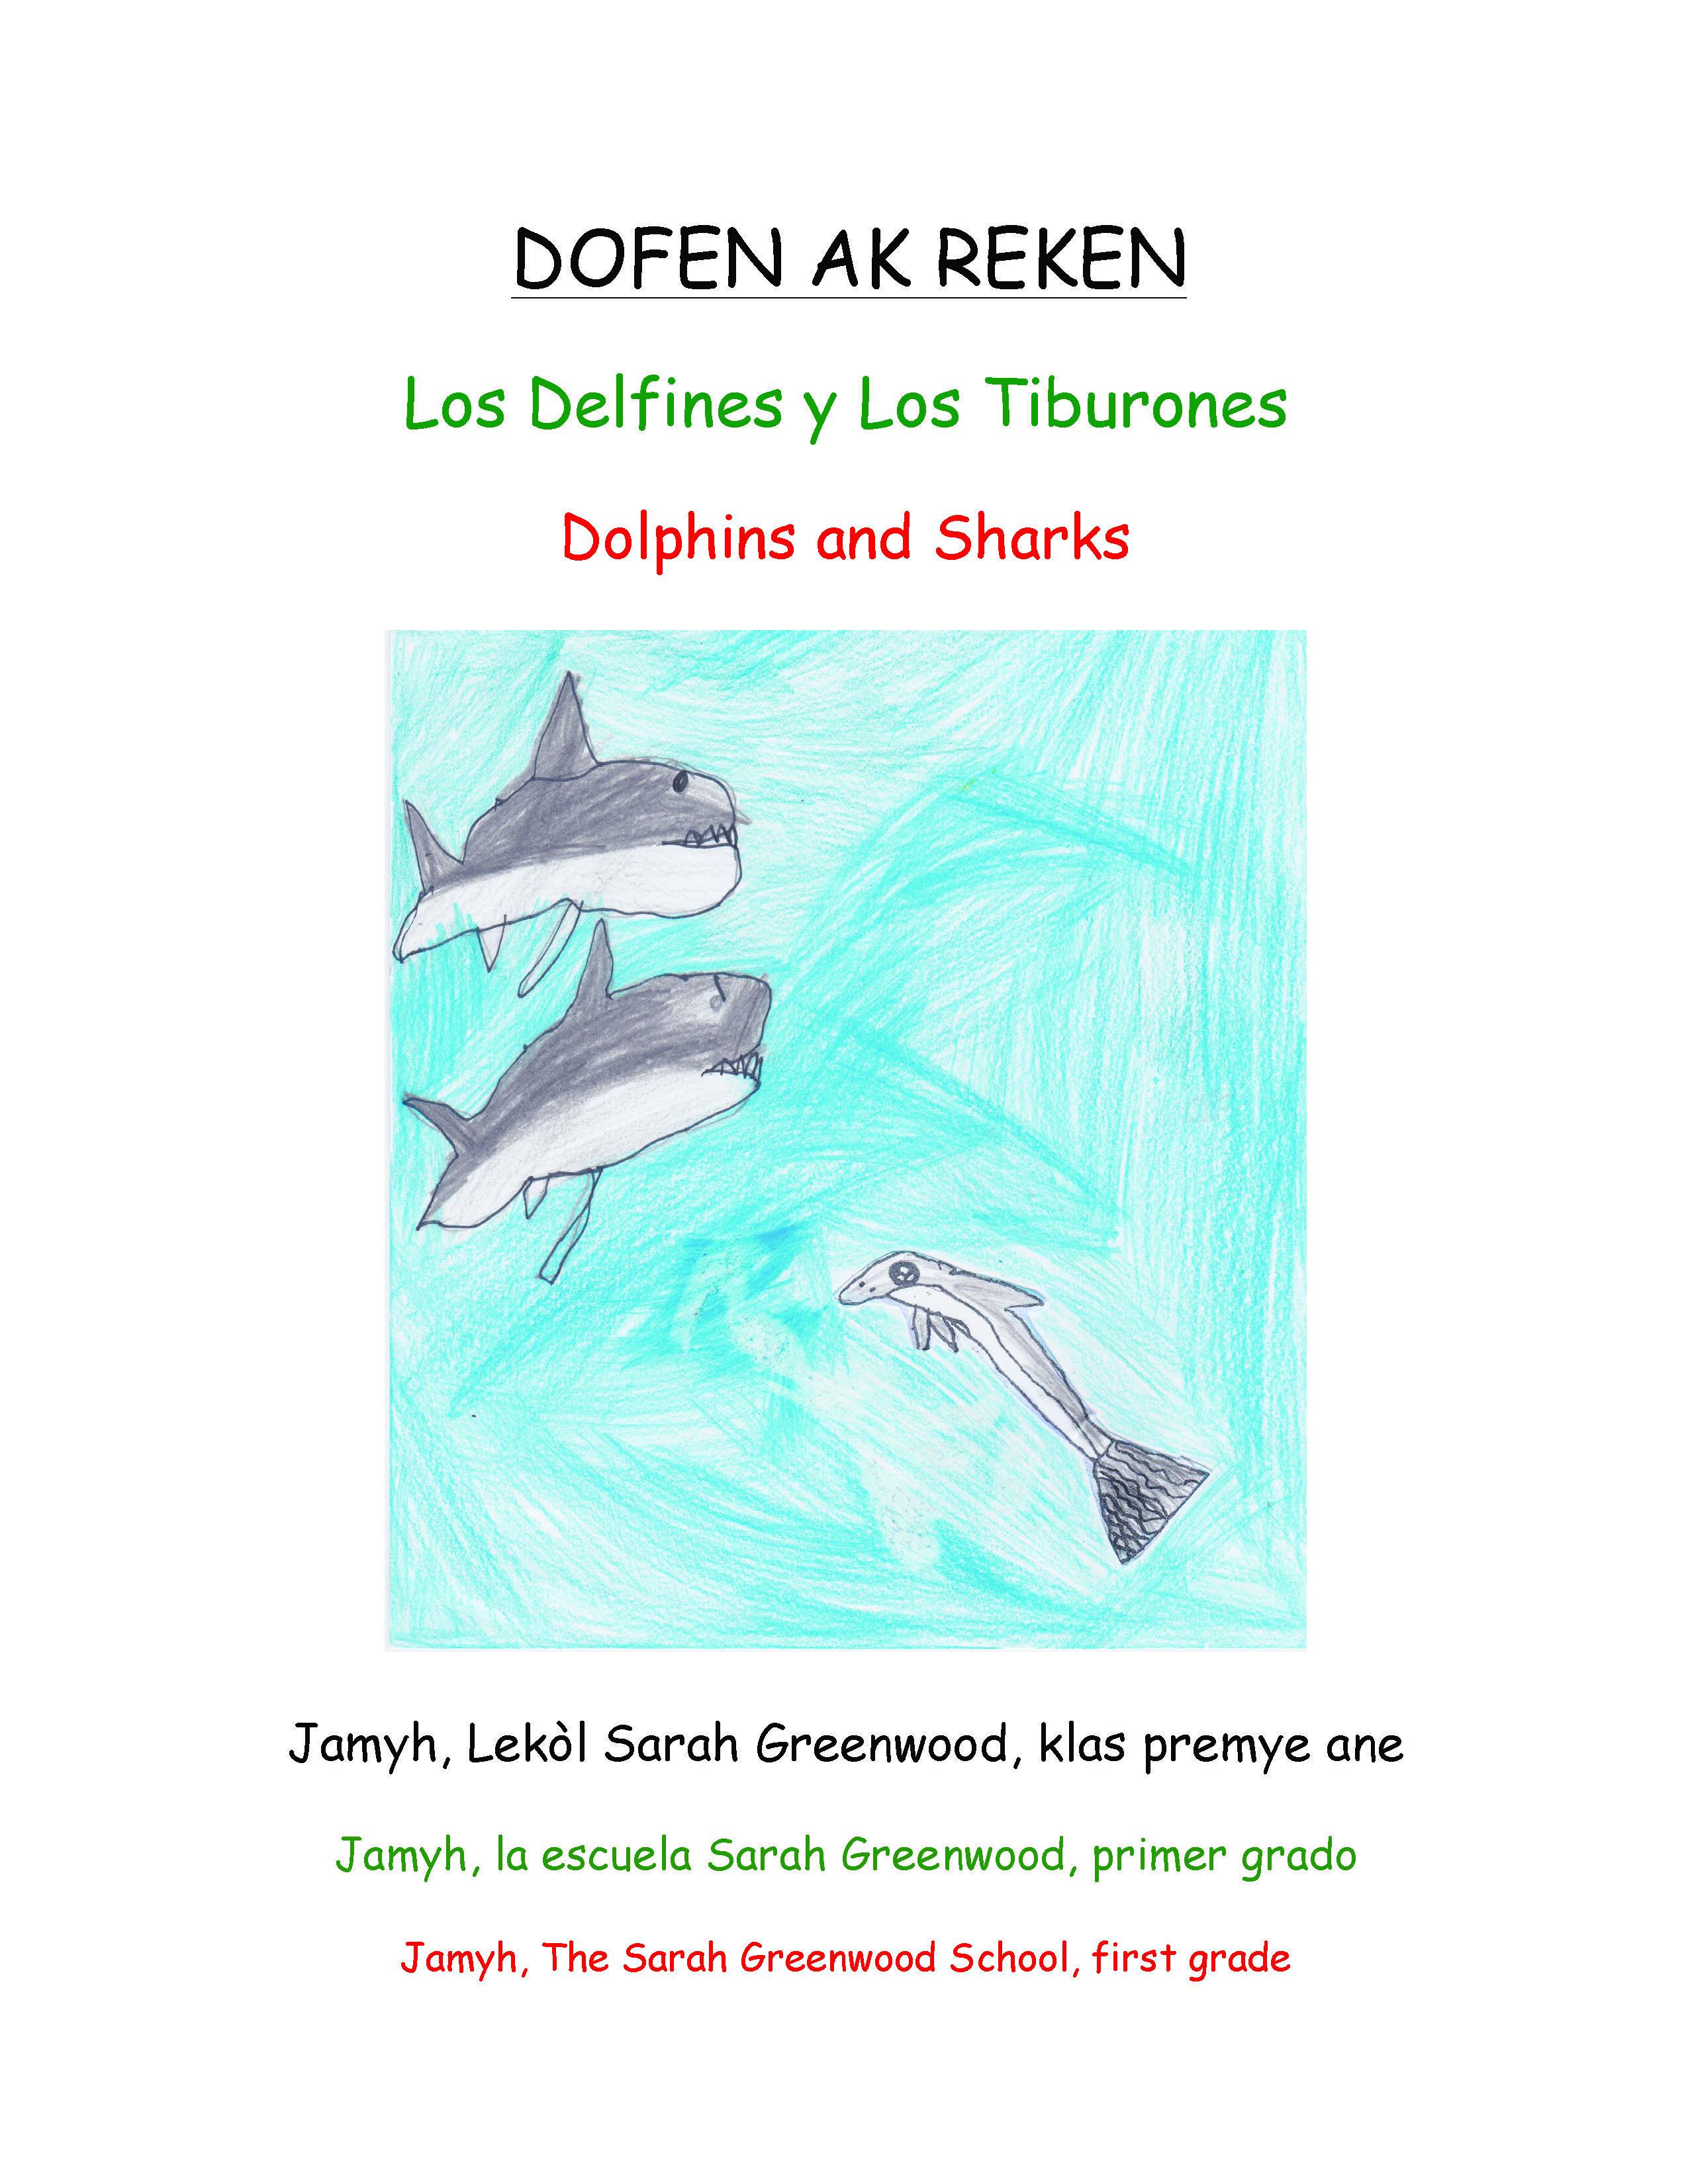 DOFEN AK REKEN / Dolphins and Sharks